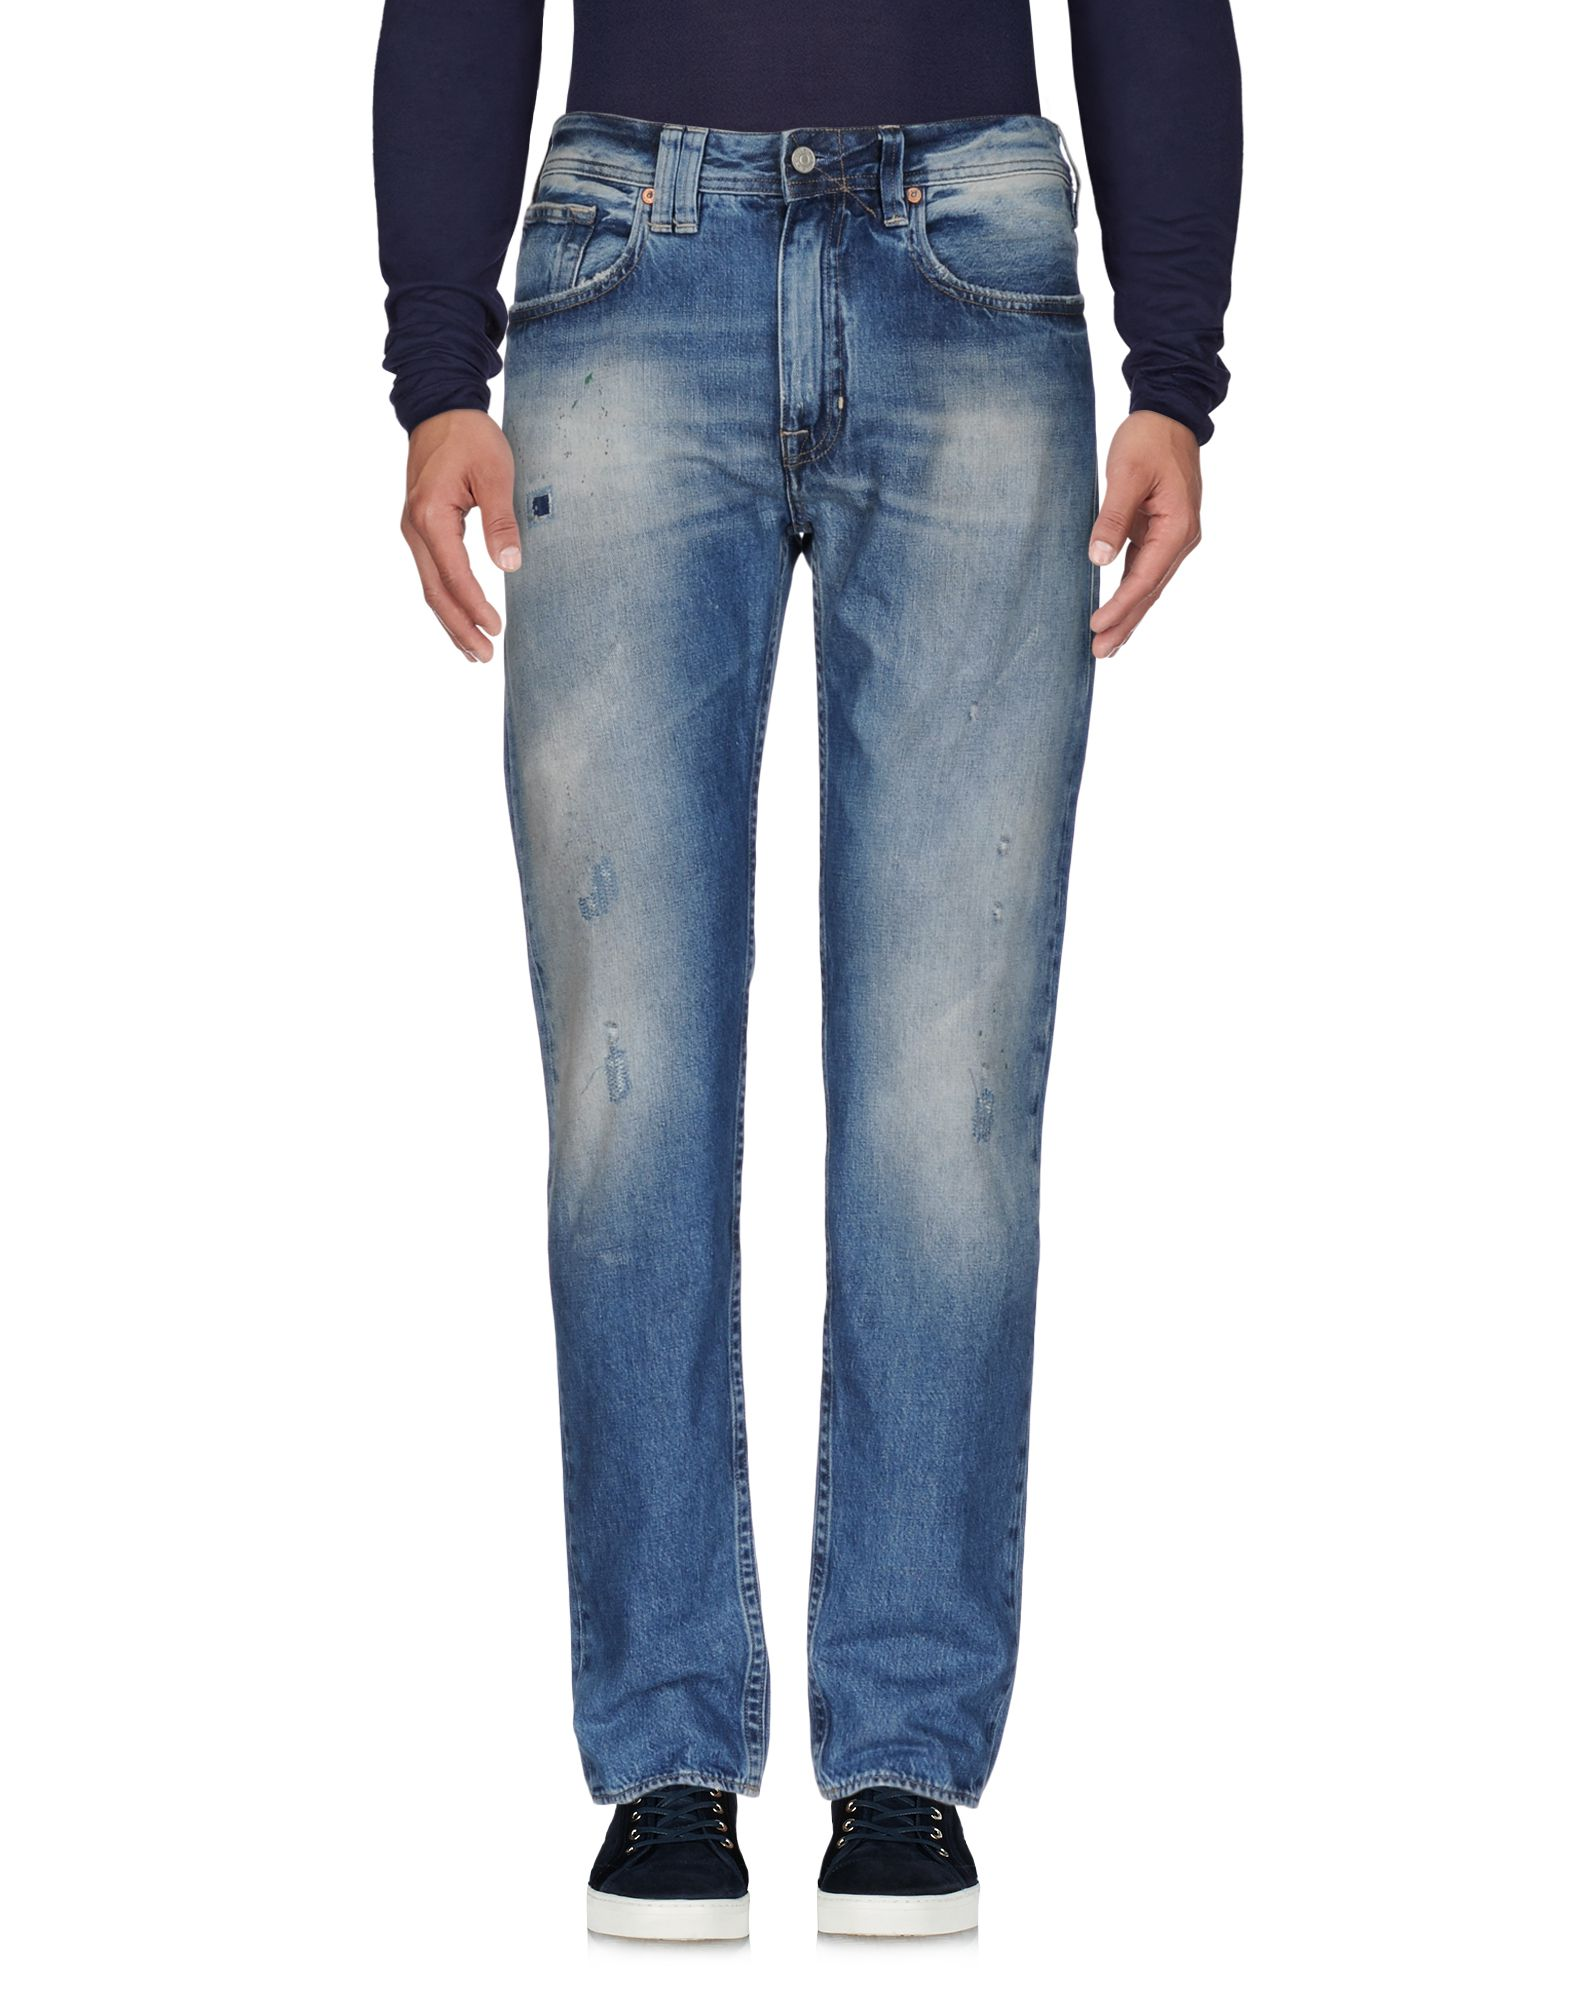 Pantaloni Jeans Cycle 42609059GX Uomo - 42609059GX Cycle 0966b7